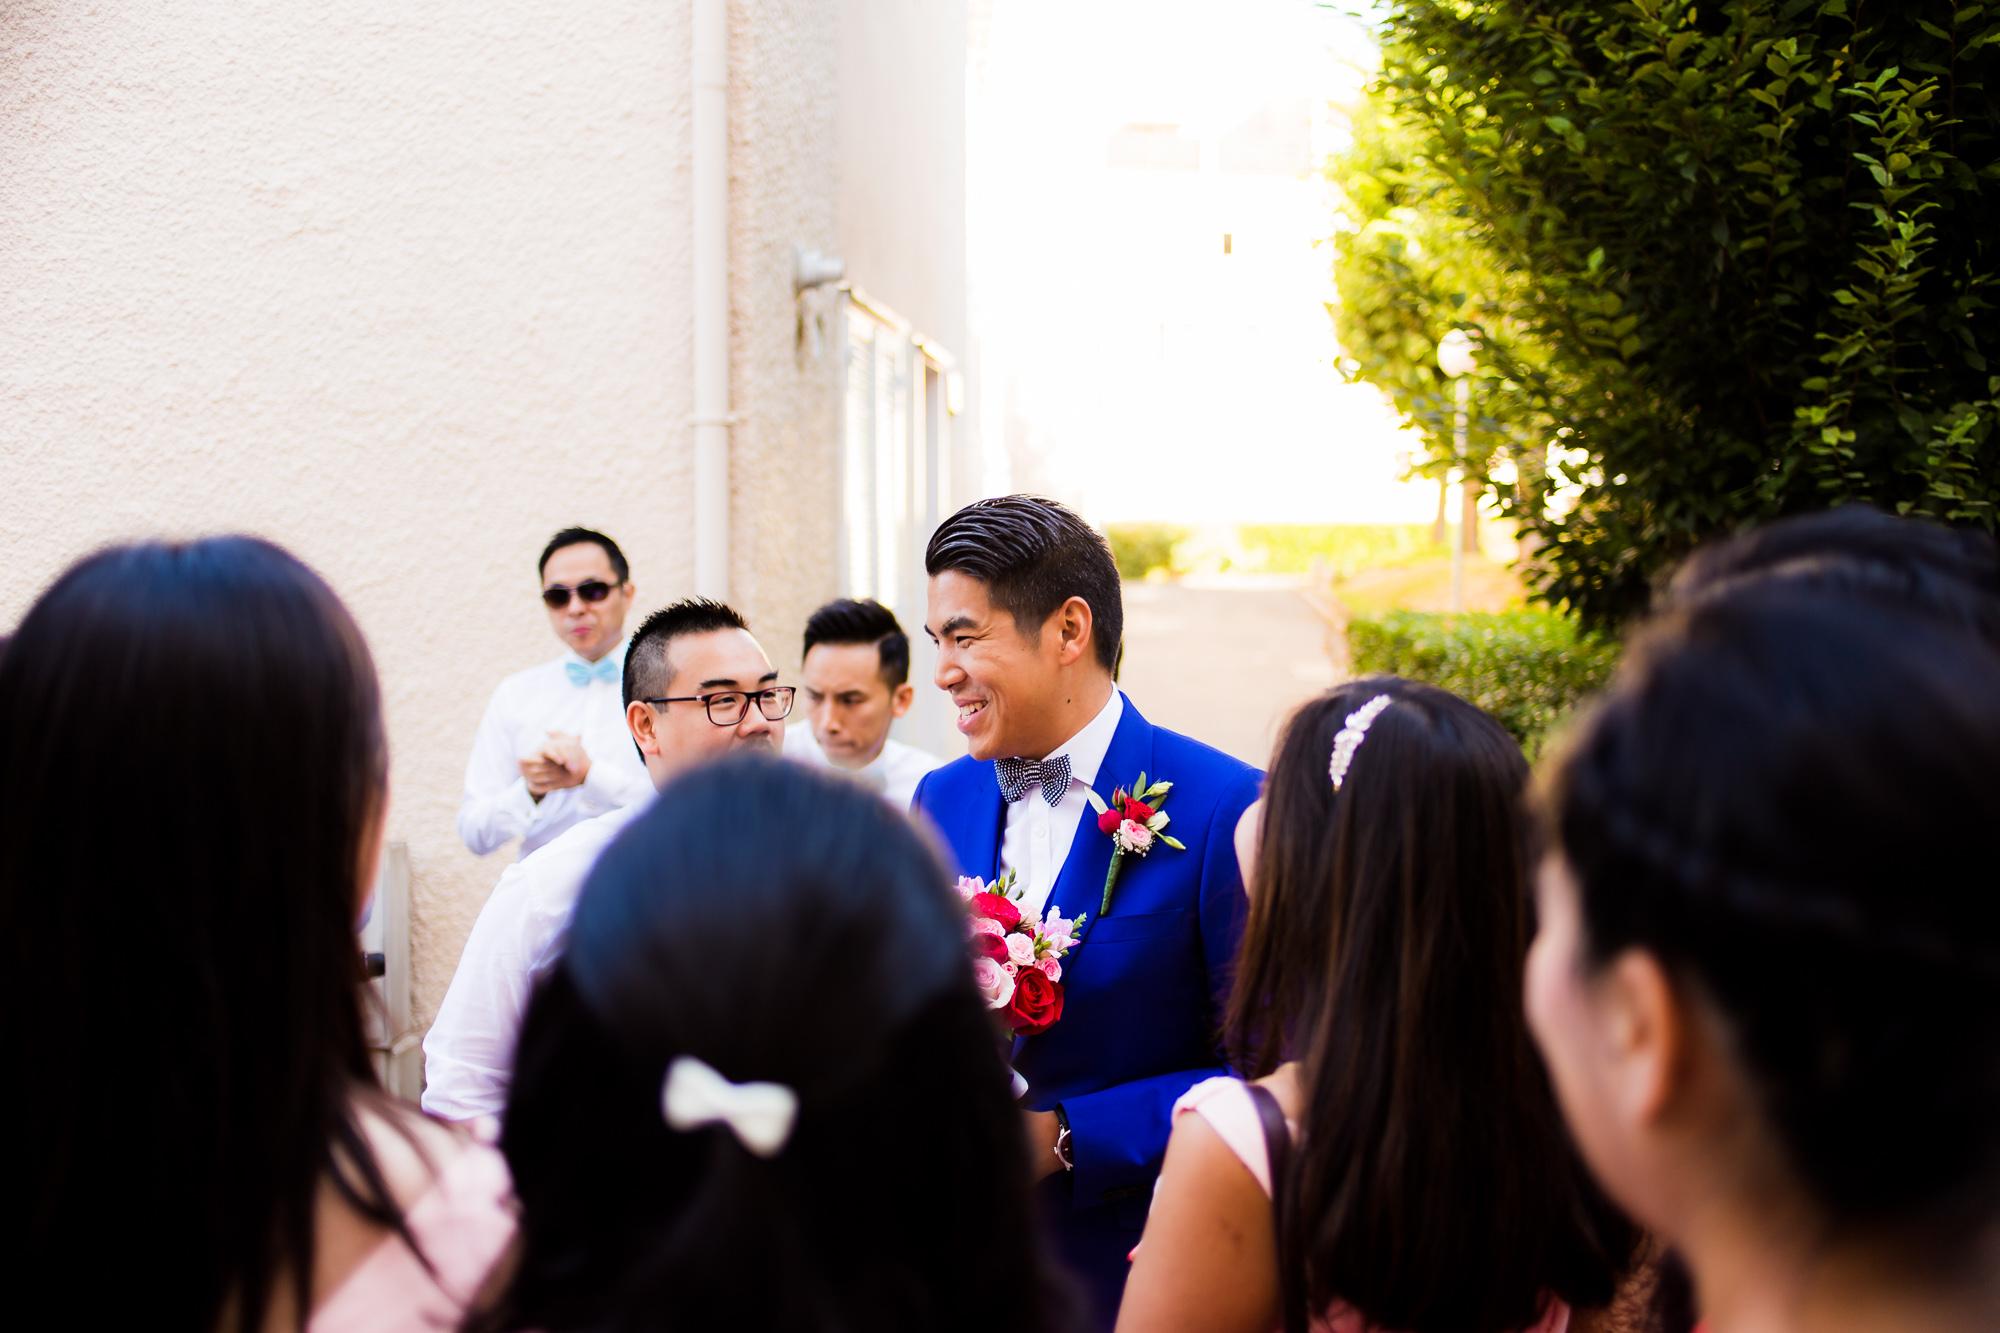 Mariage au Manoir des Cygnes mariage chinois